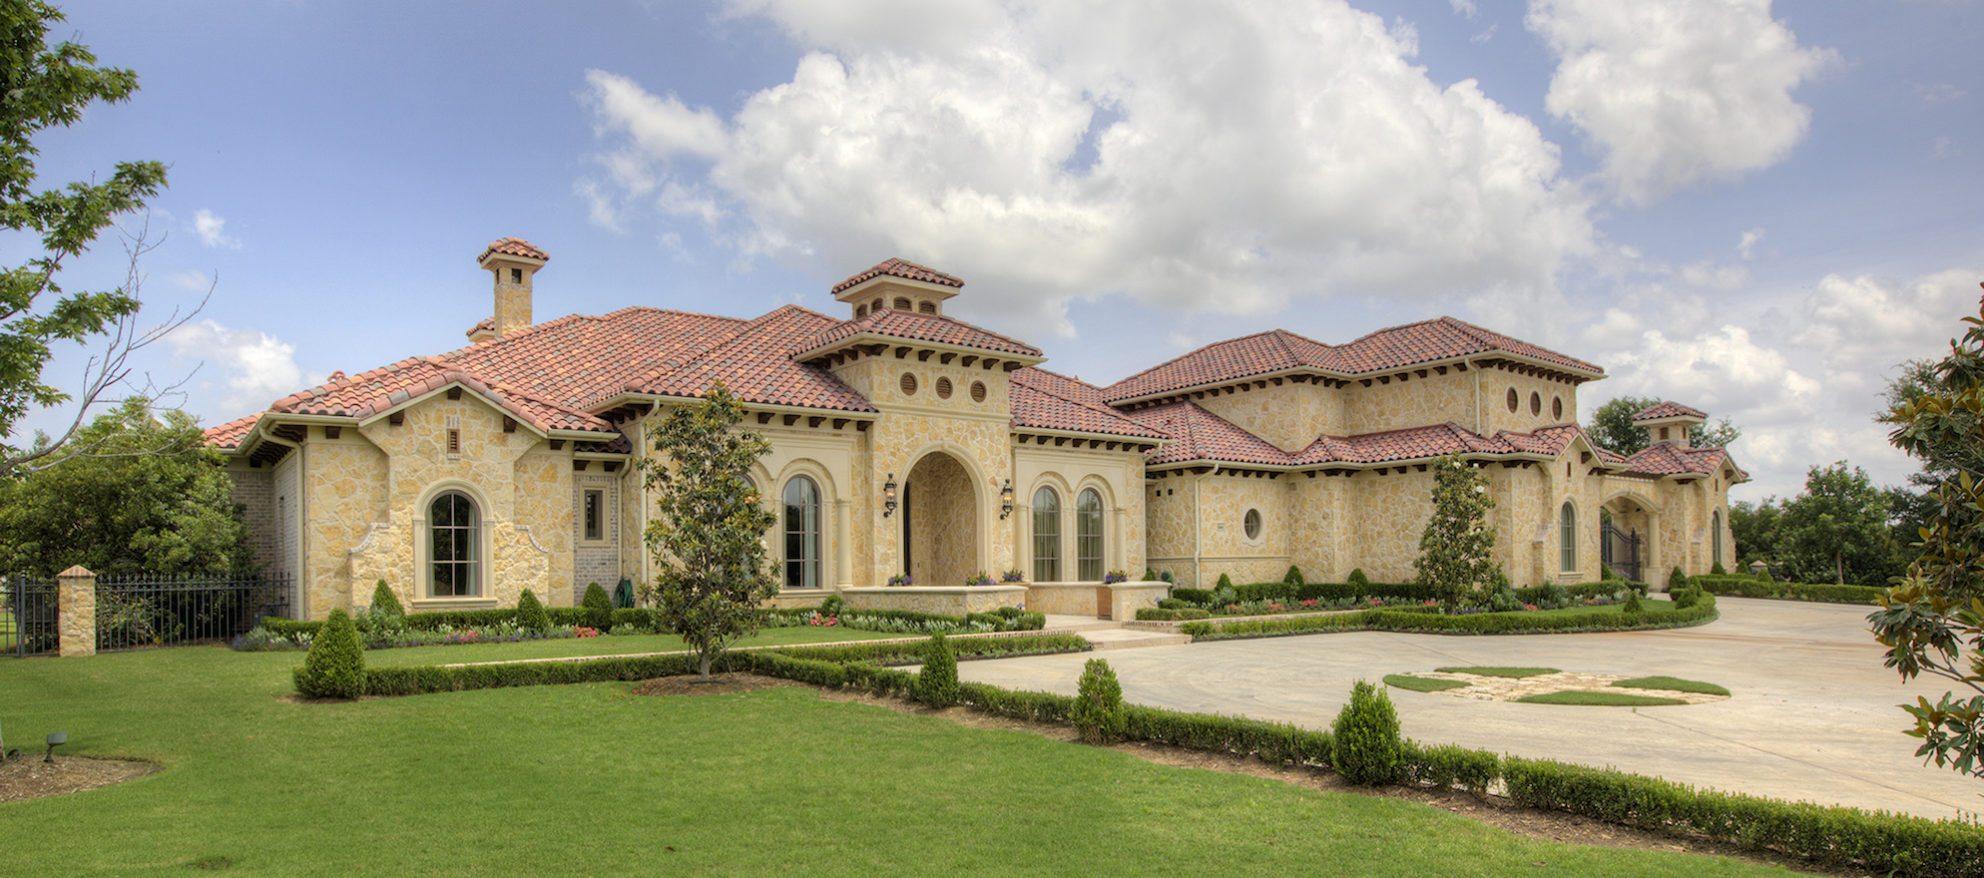 Luxury listing: Shorefront Texan Tuscan-style villa